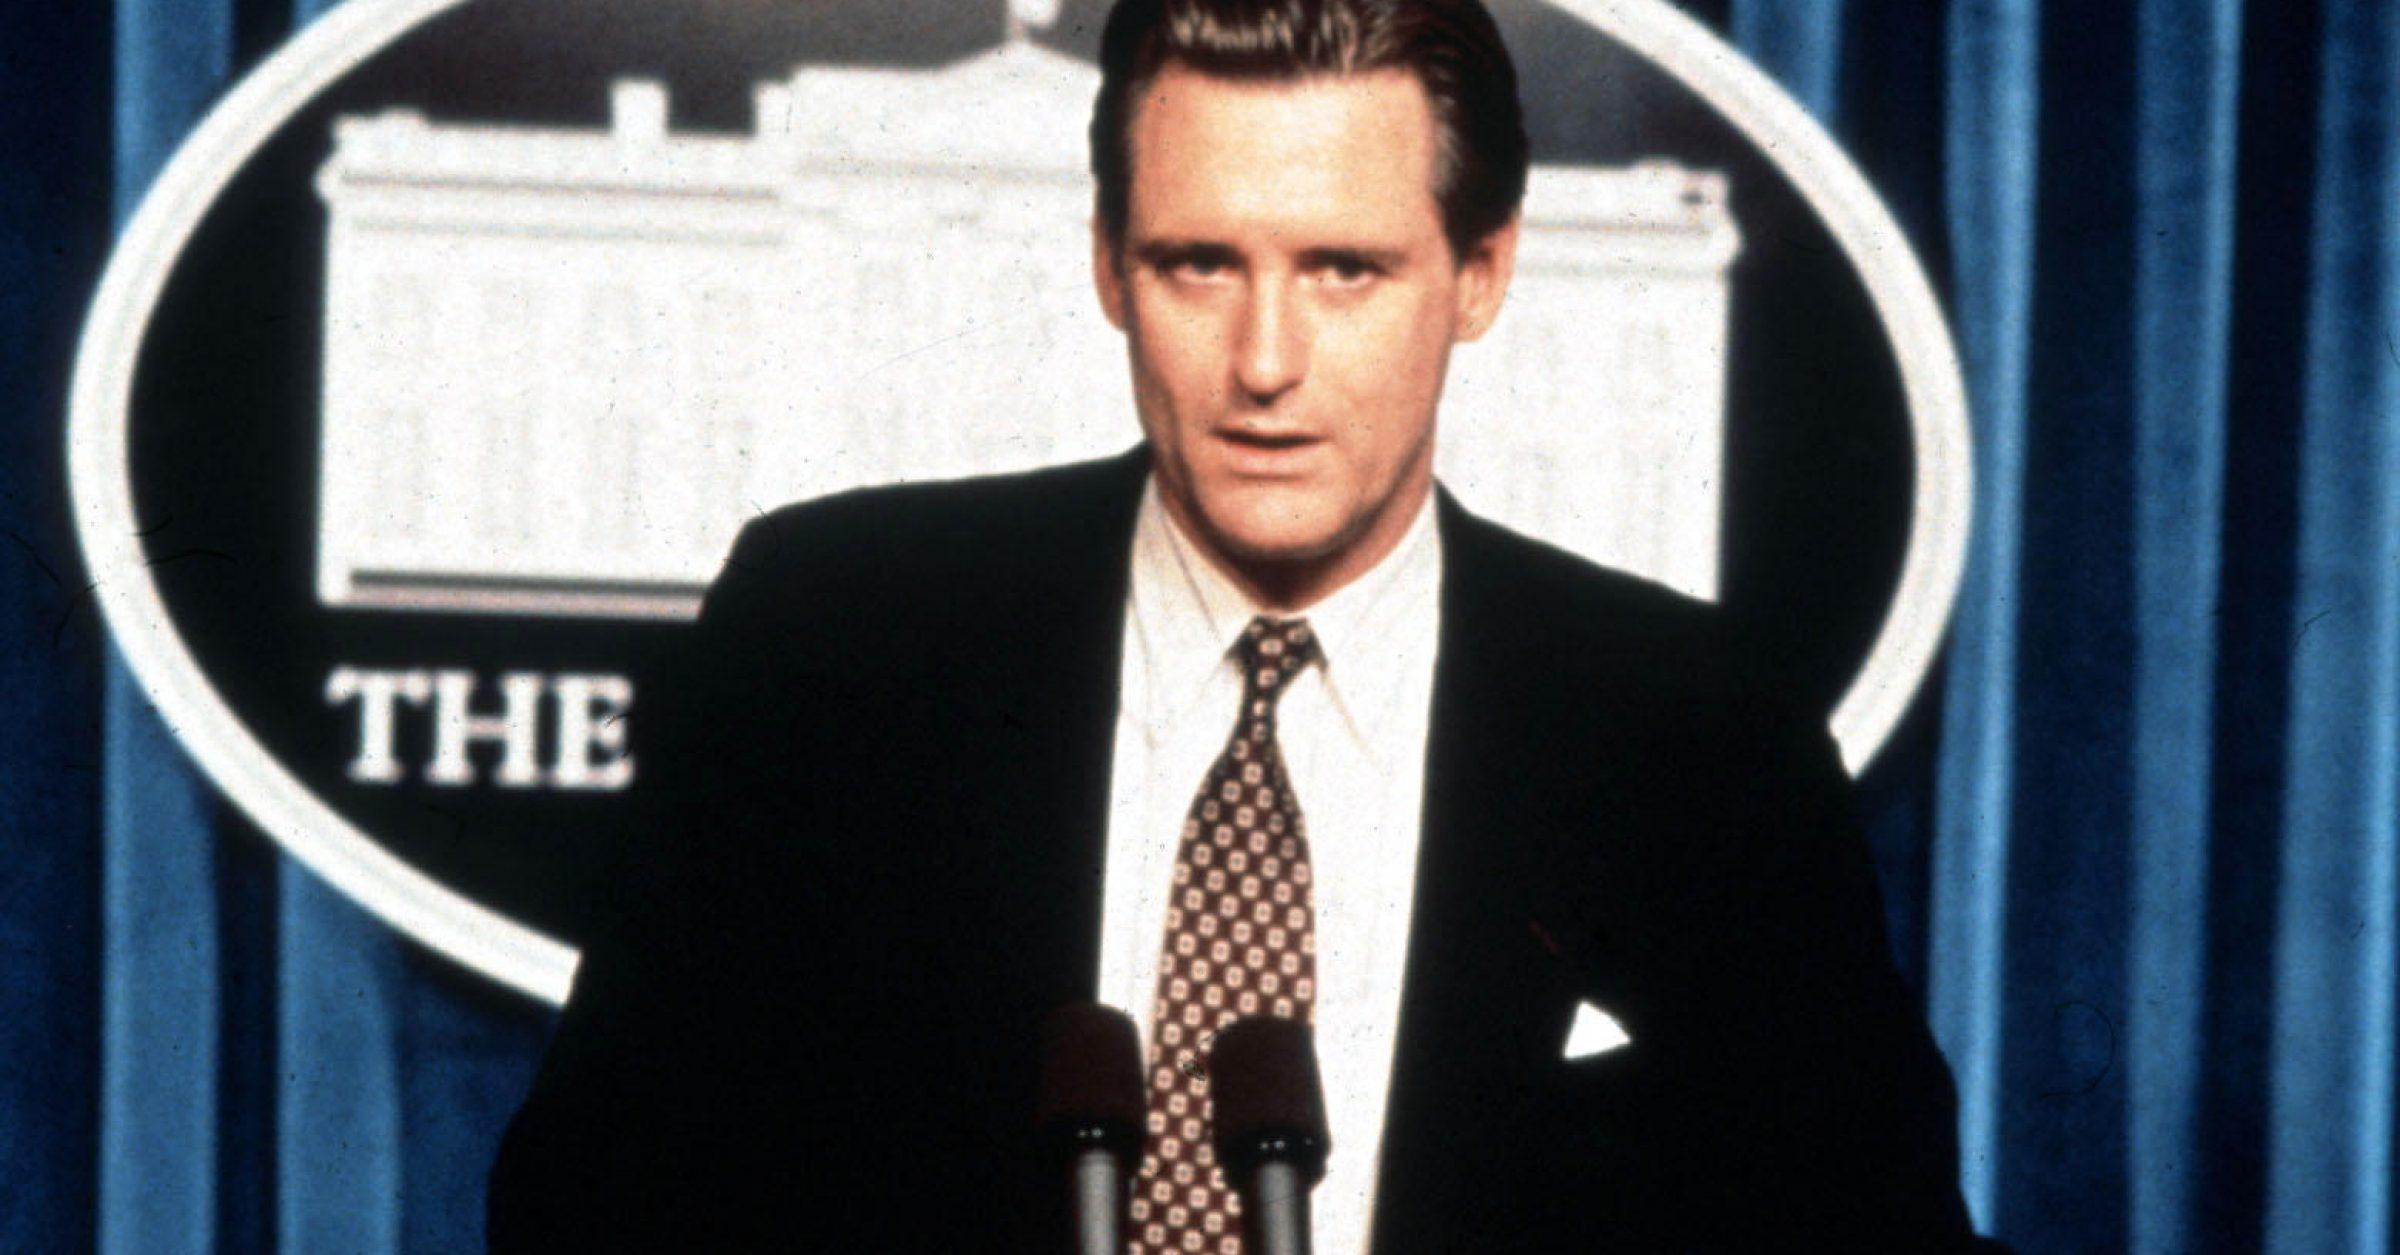 Iconic Bill Pullman